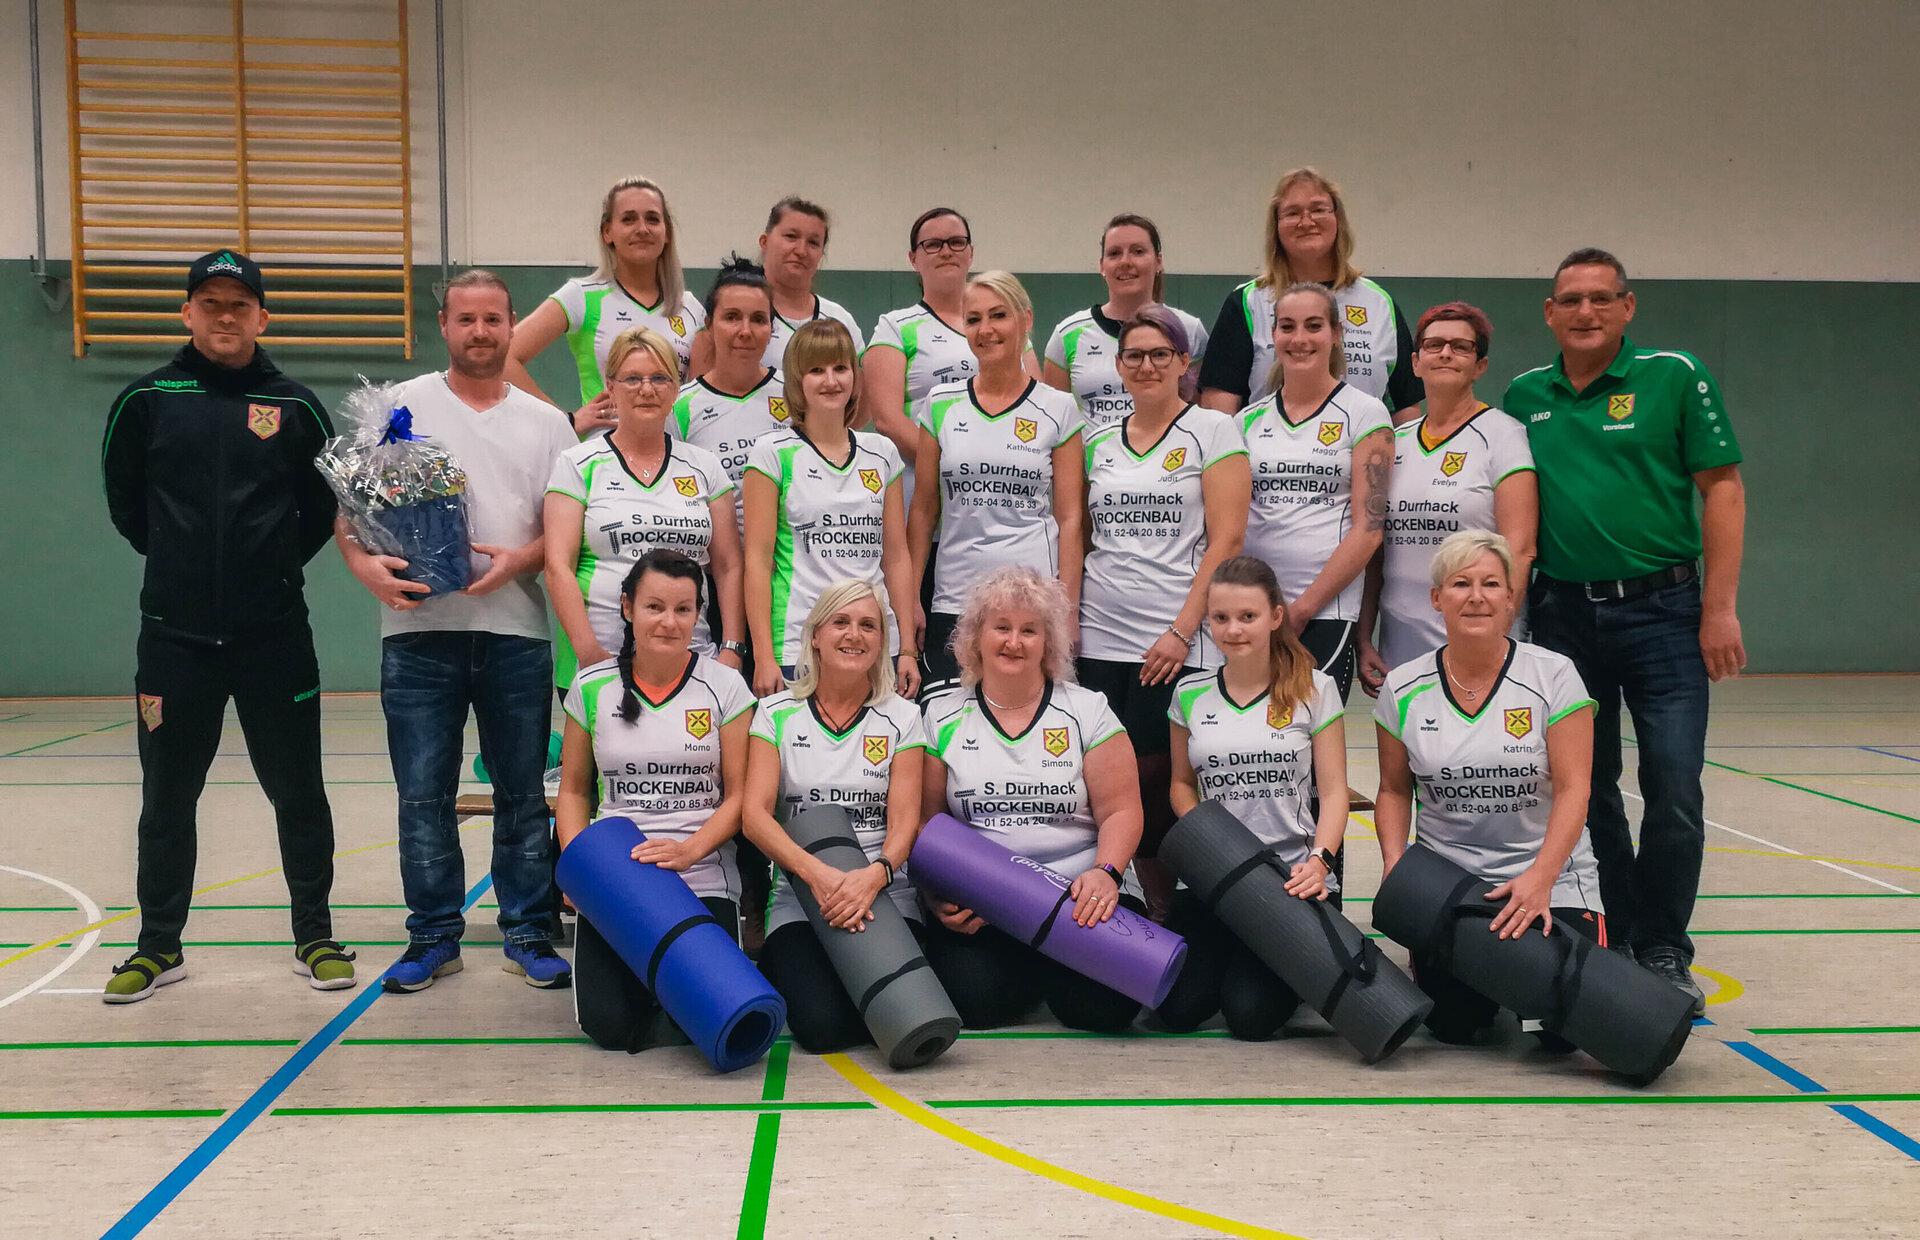 Gymnastikdamen des TSV Grün-Weiß Kleinmühlingen/Zens e.V.